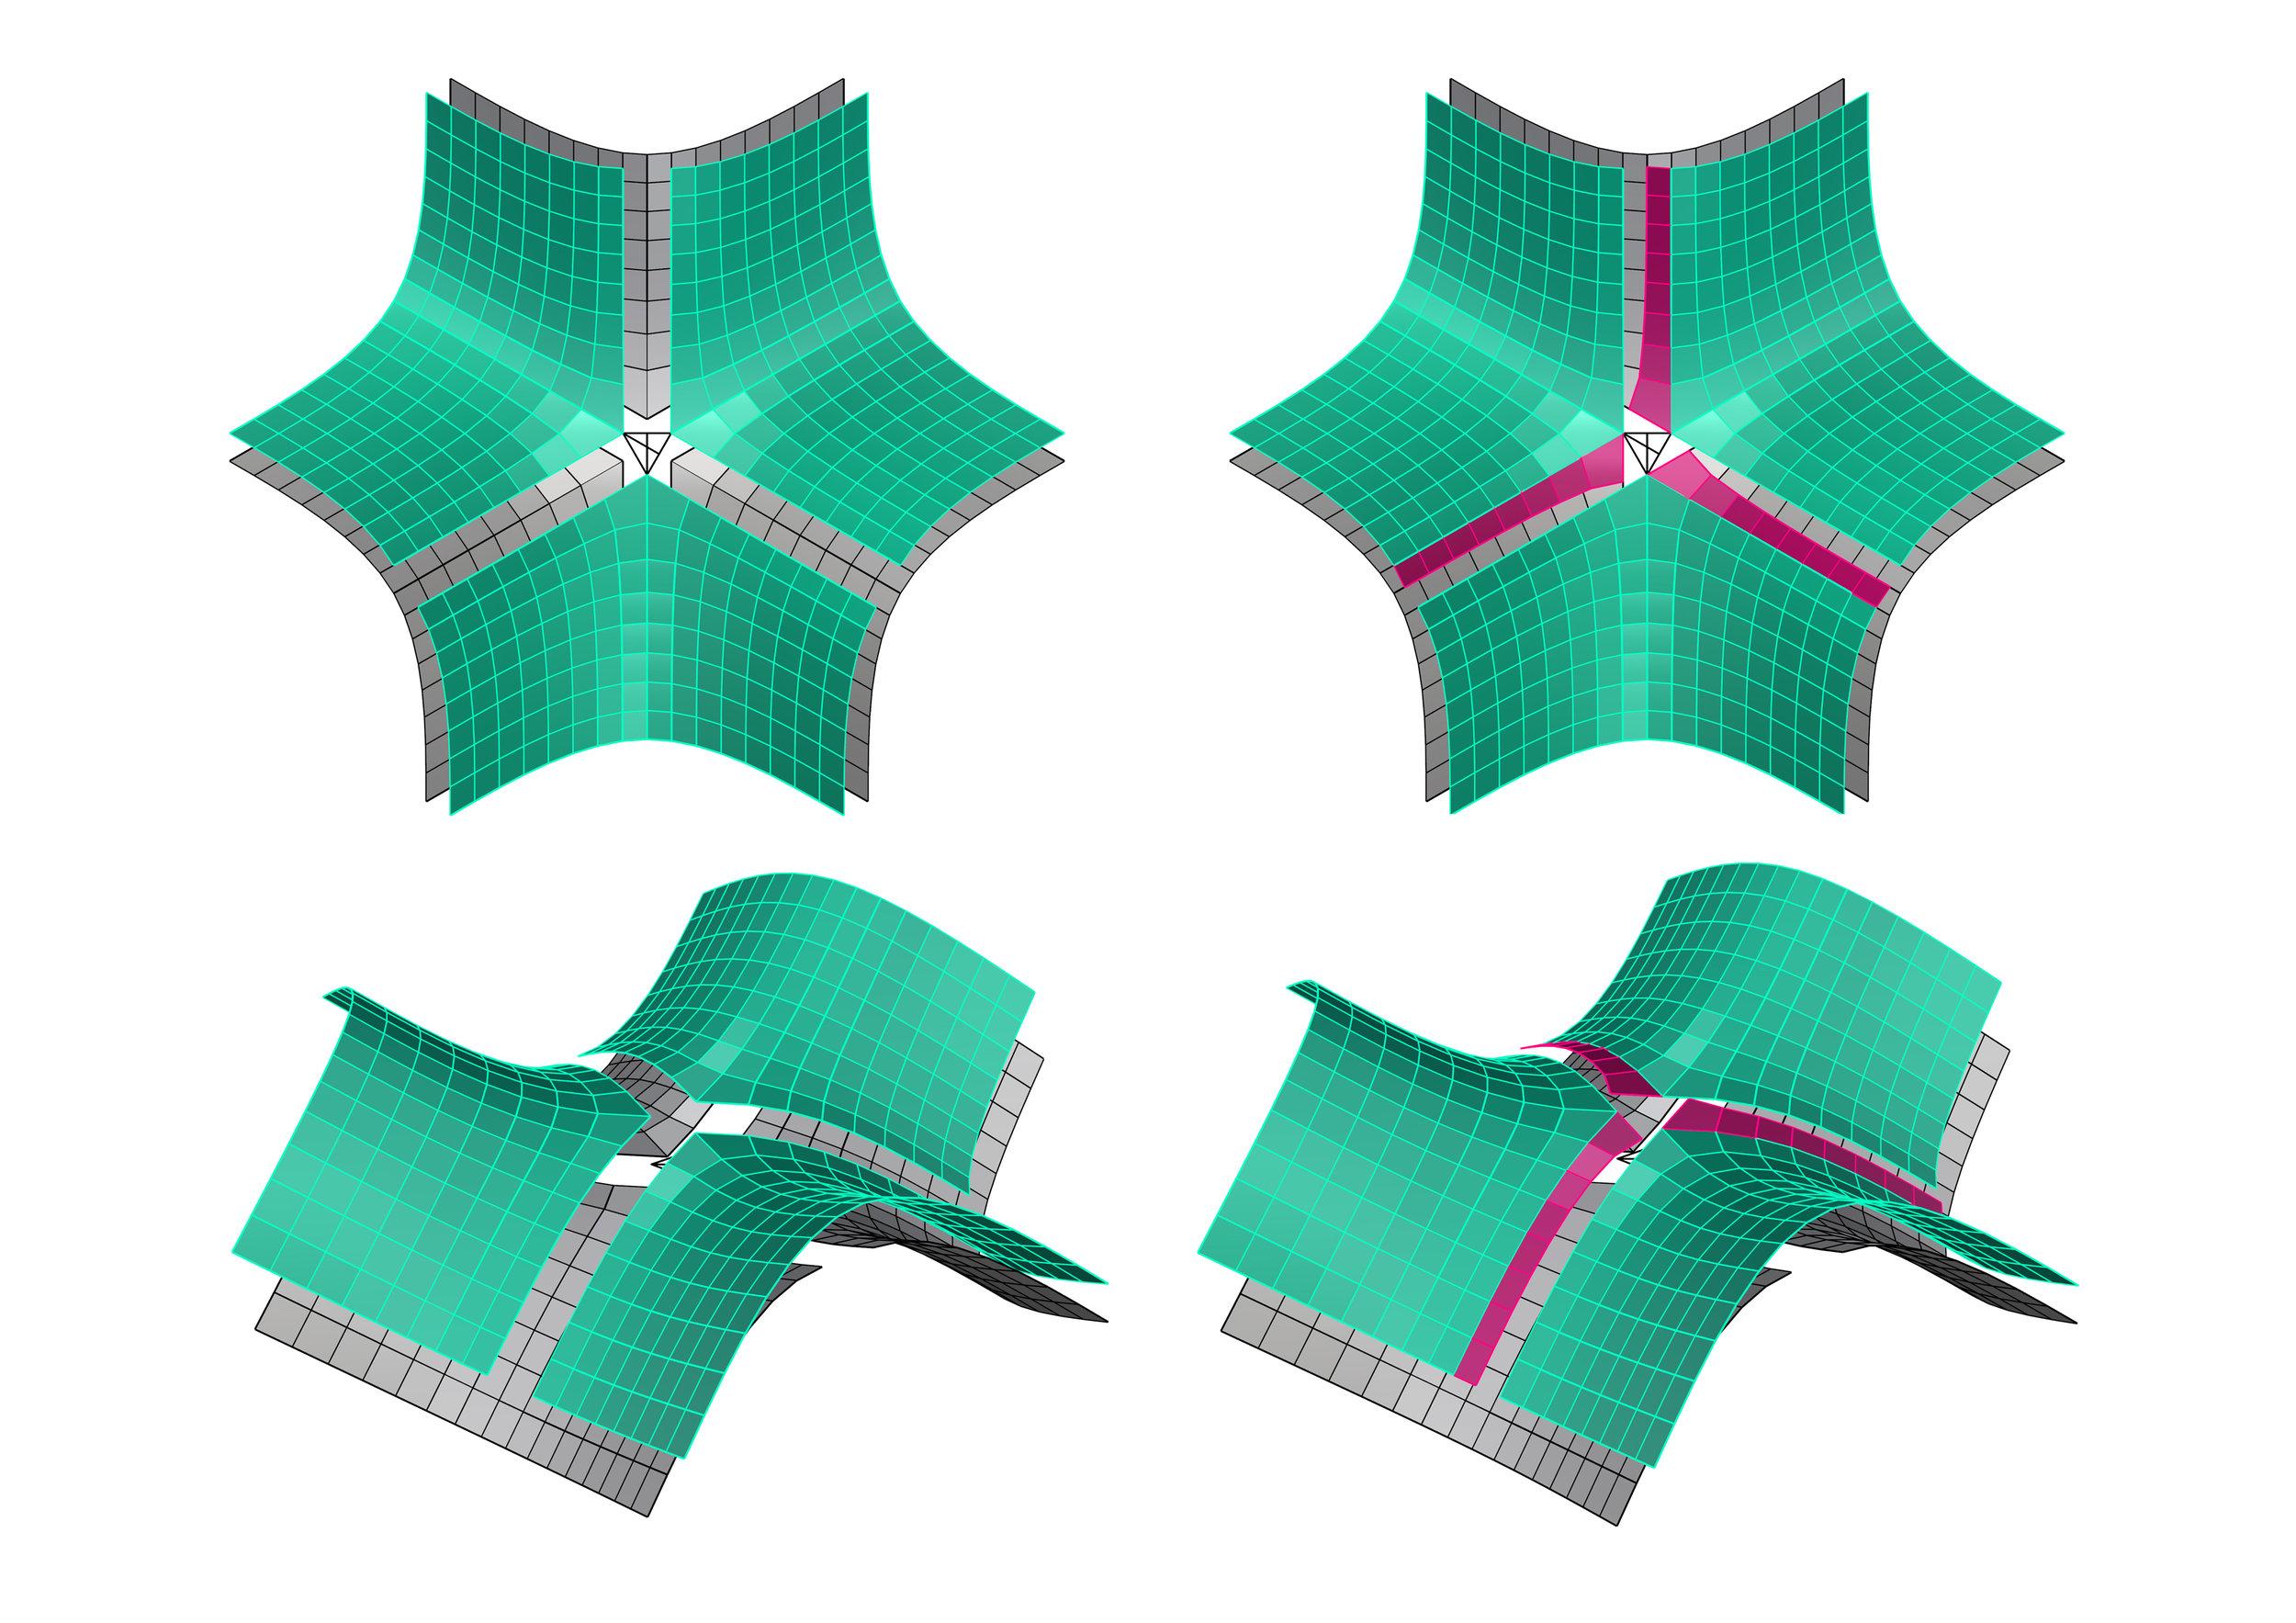 Kintetic Tiling 004.jpg